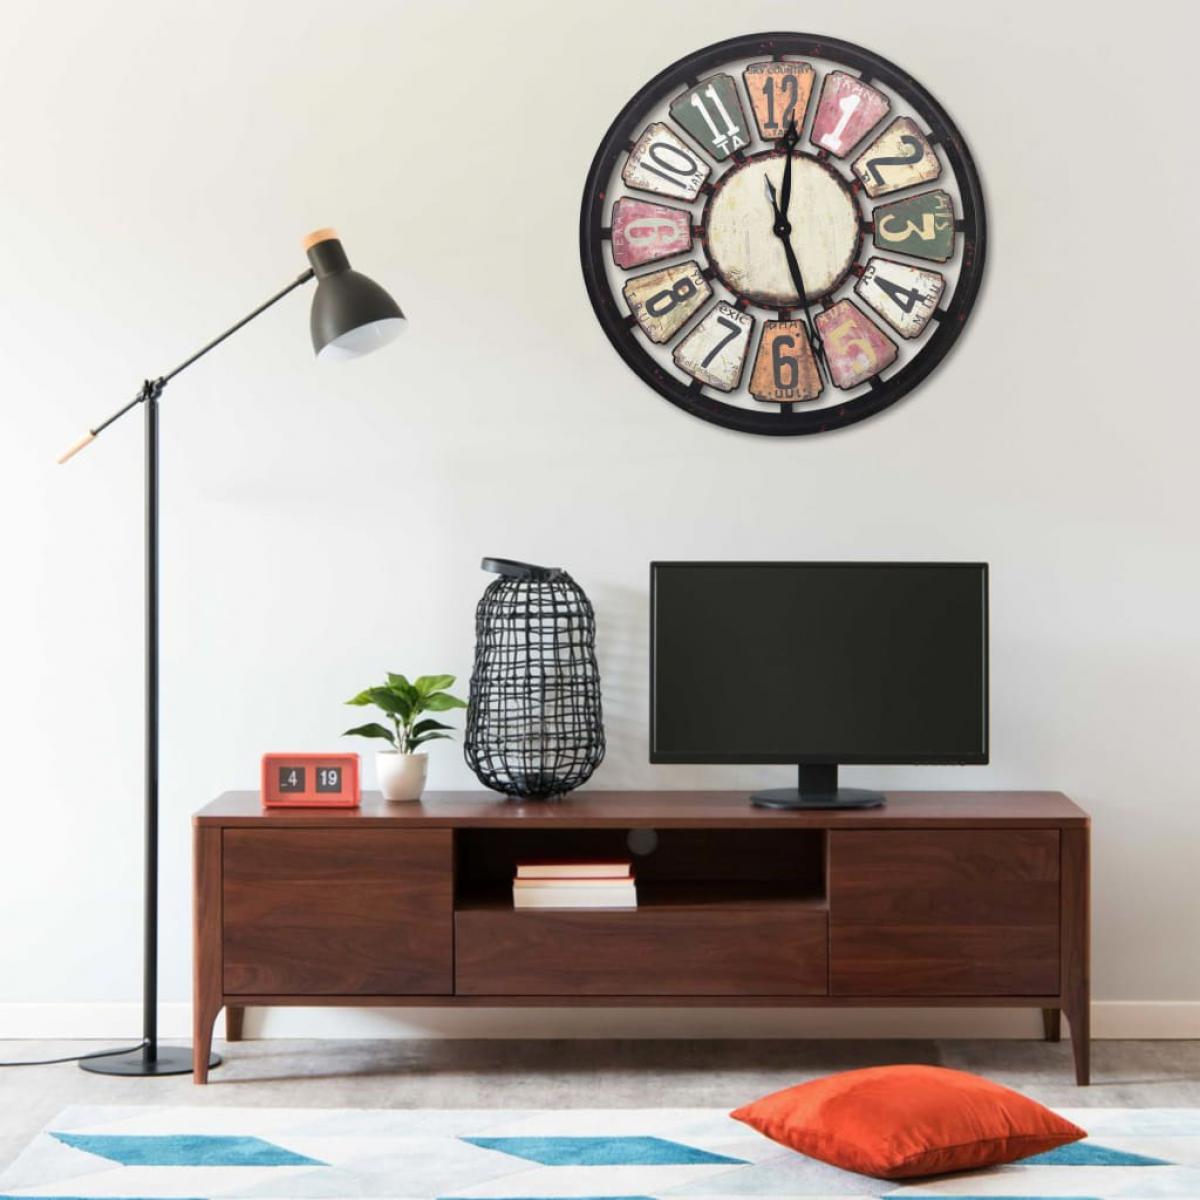 Vidaxl vidaXL Horloge murale Multicolore 80 cm MDF